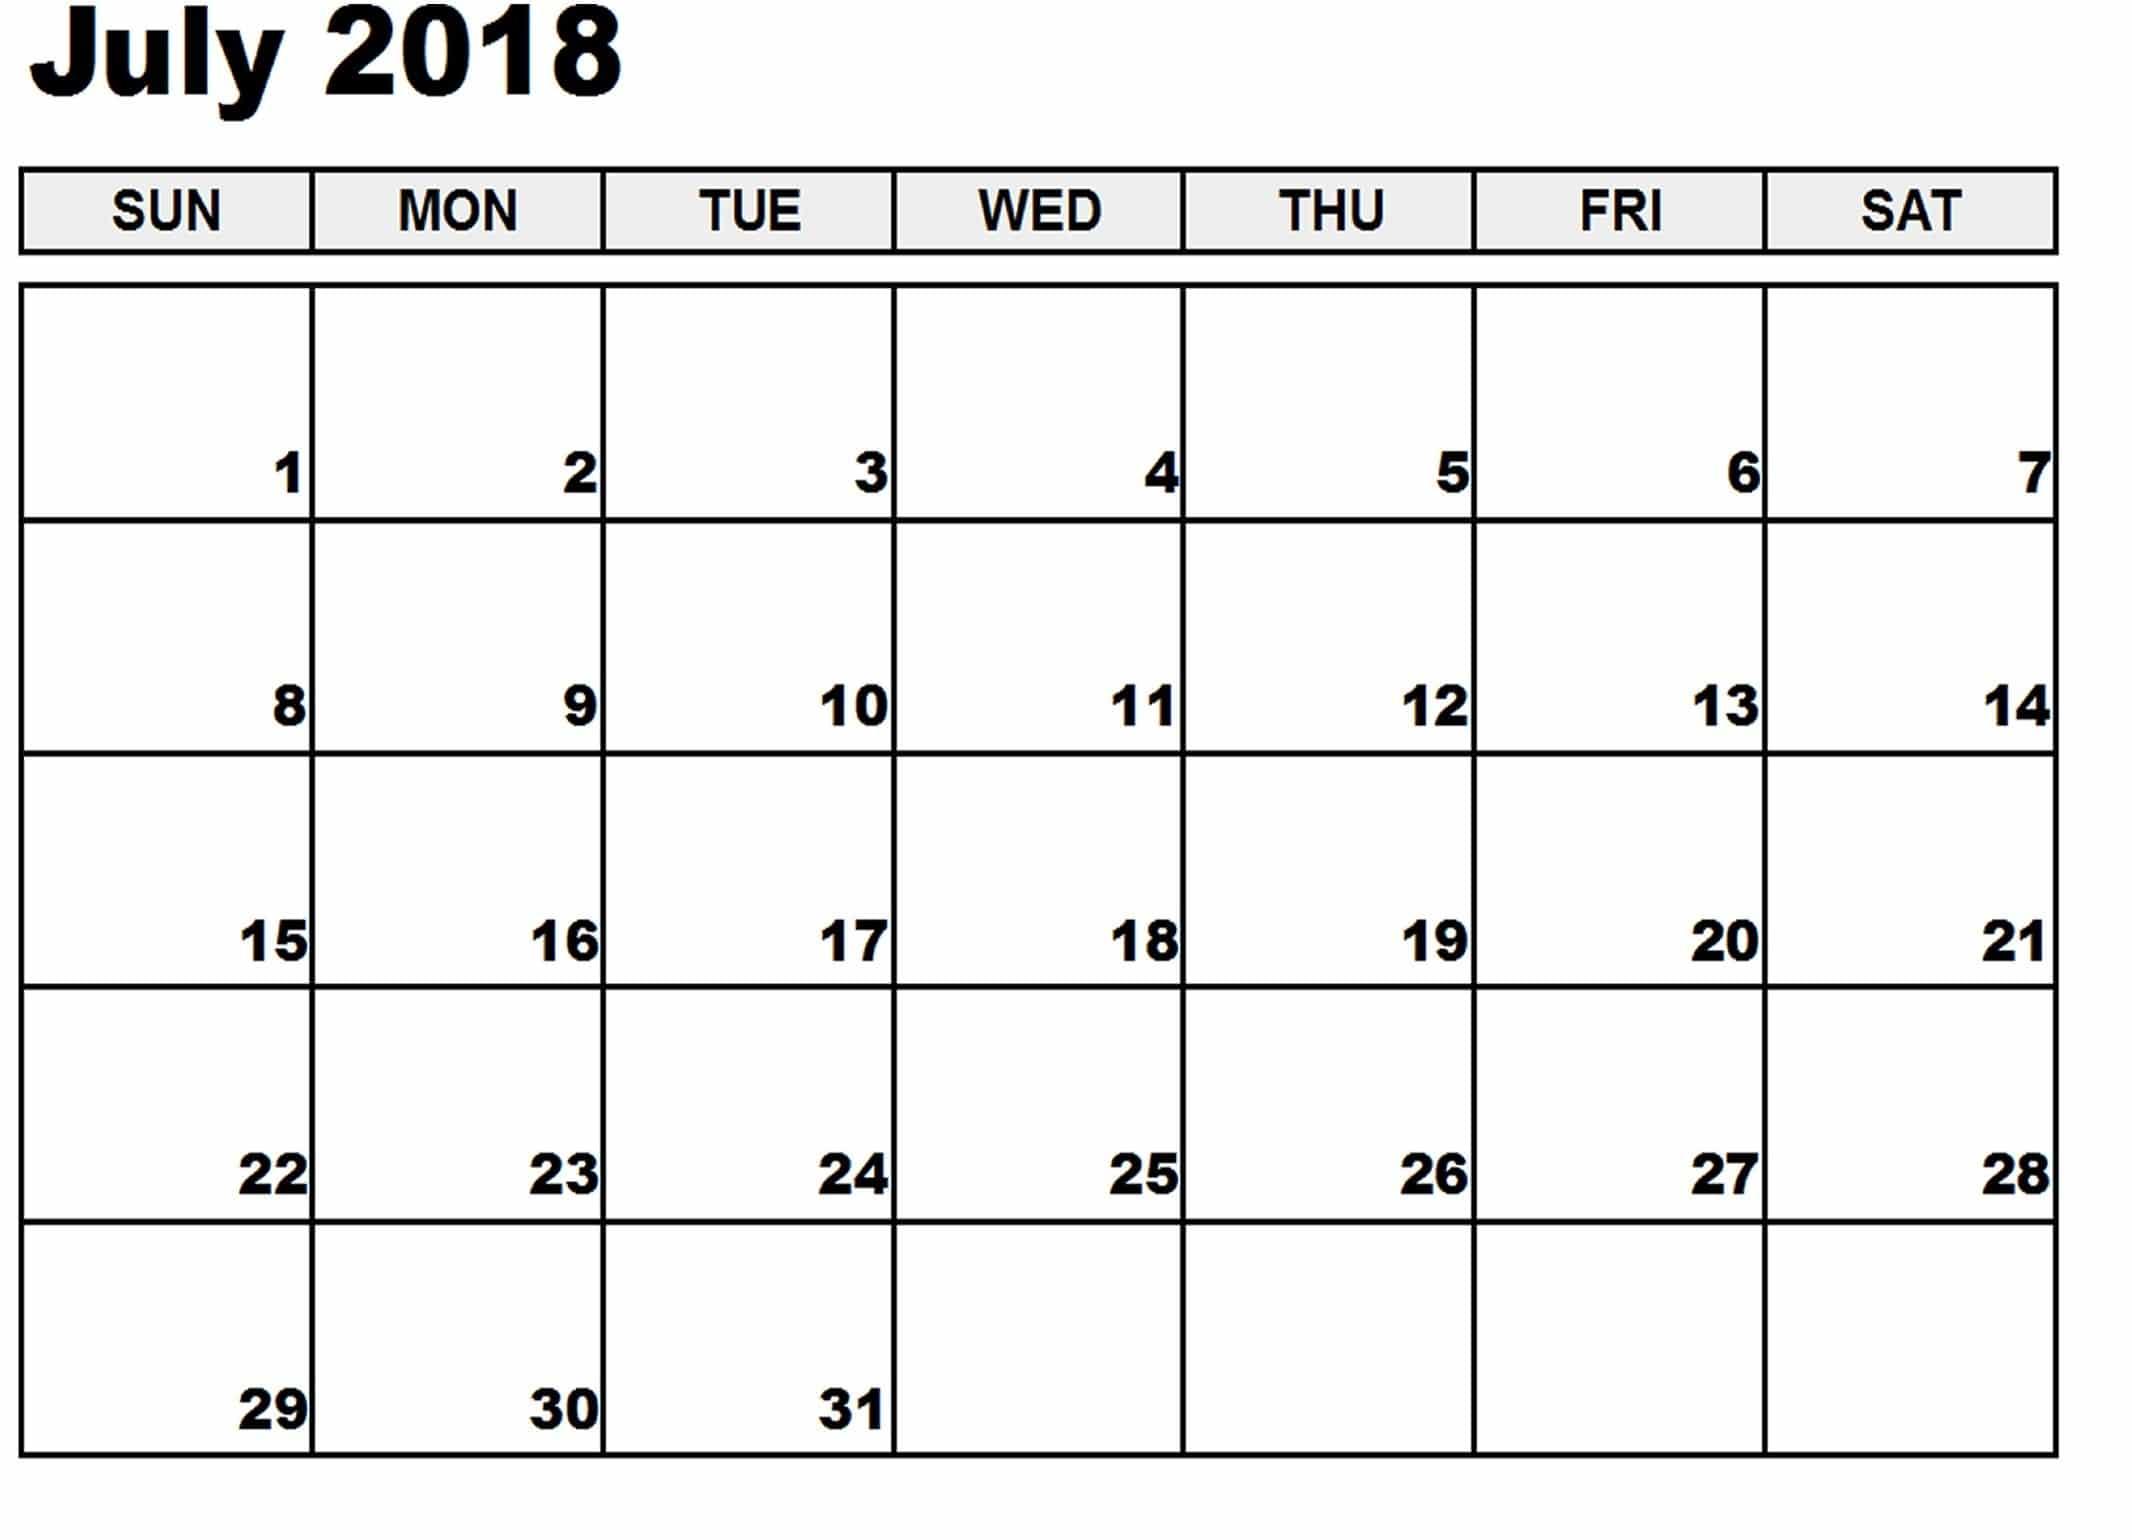 July 2018 Calendar Calendar 2017 Printable Throughout Printable